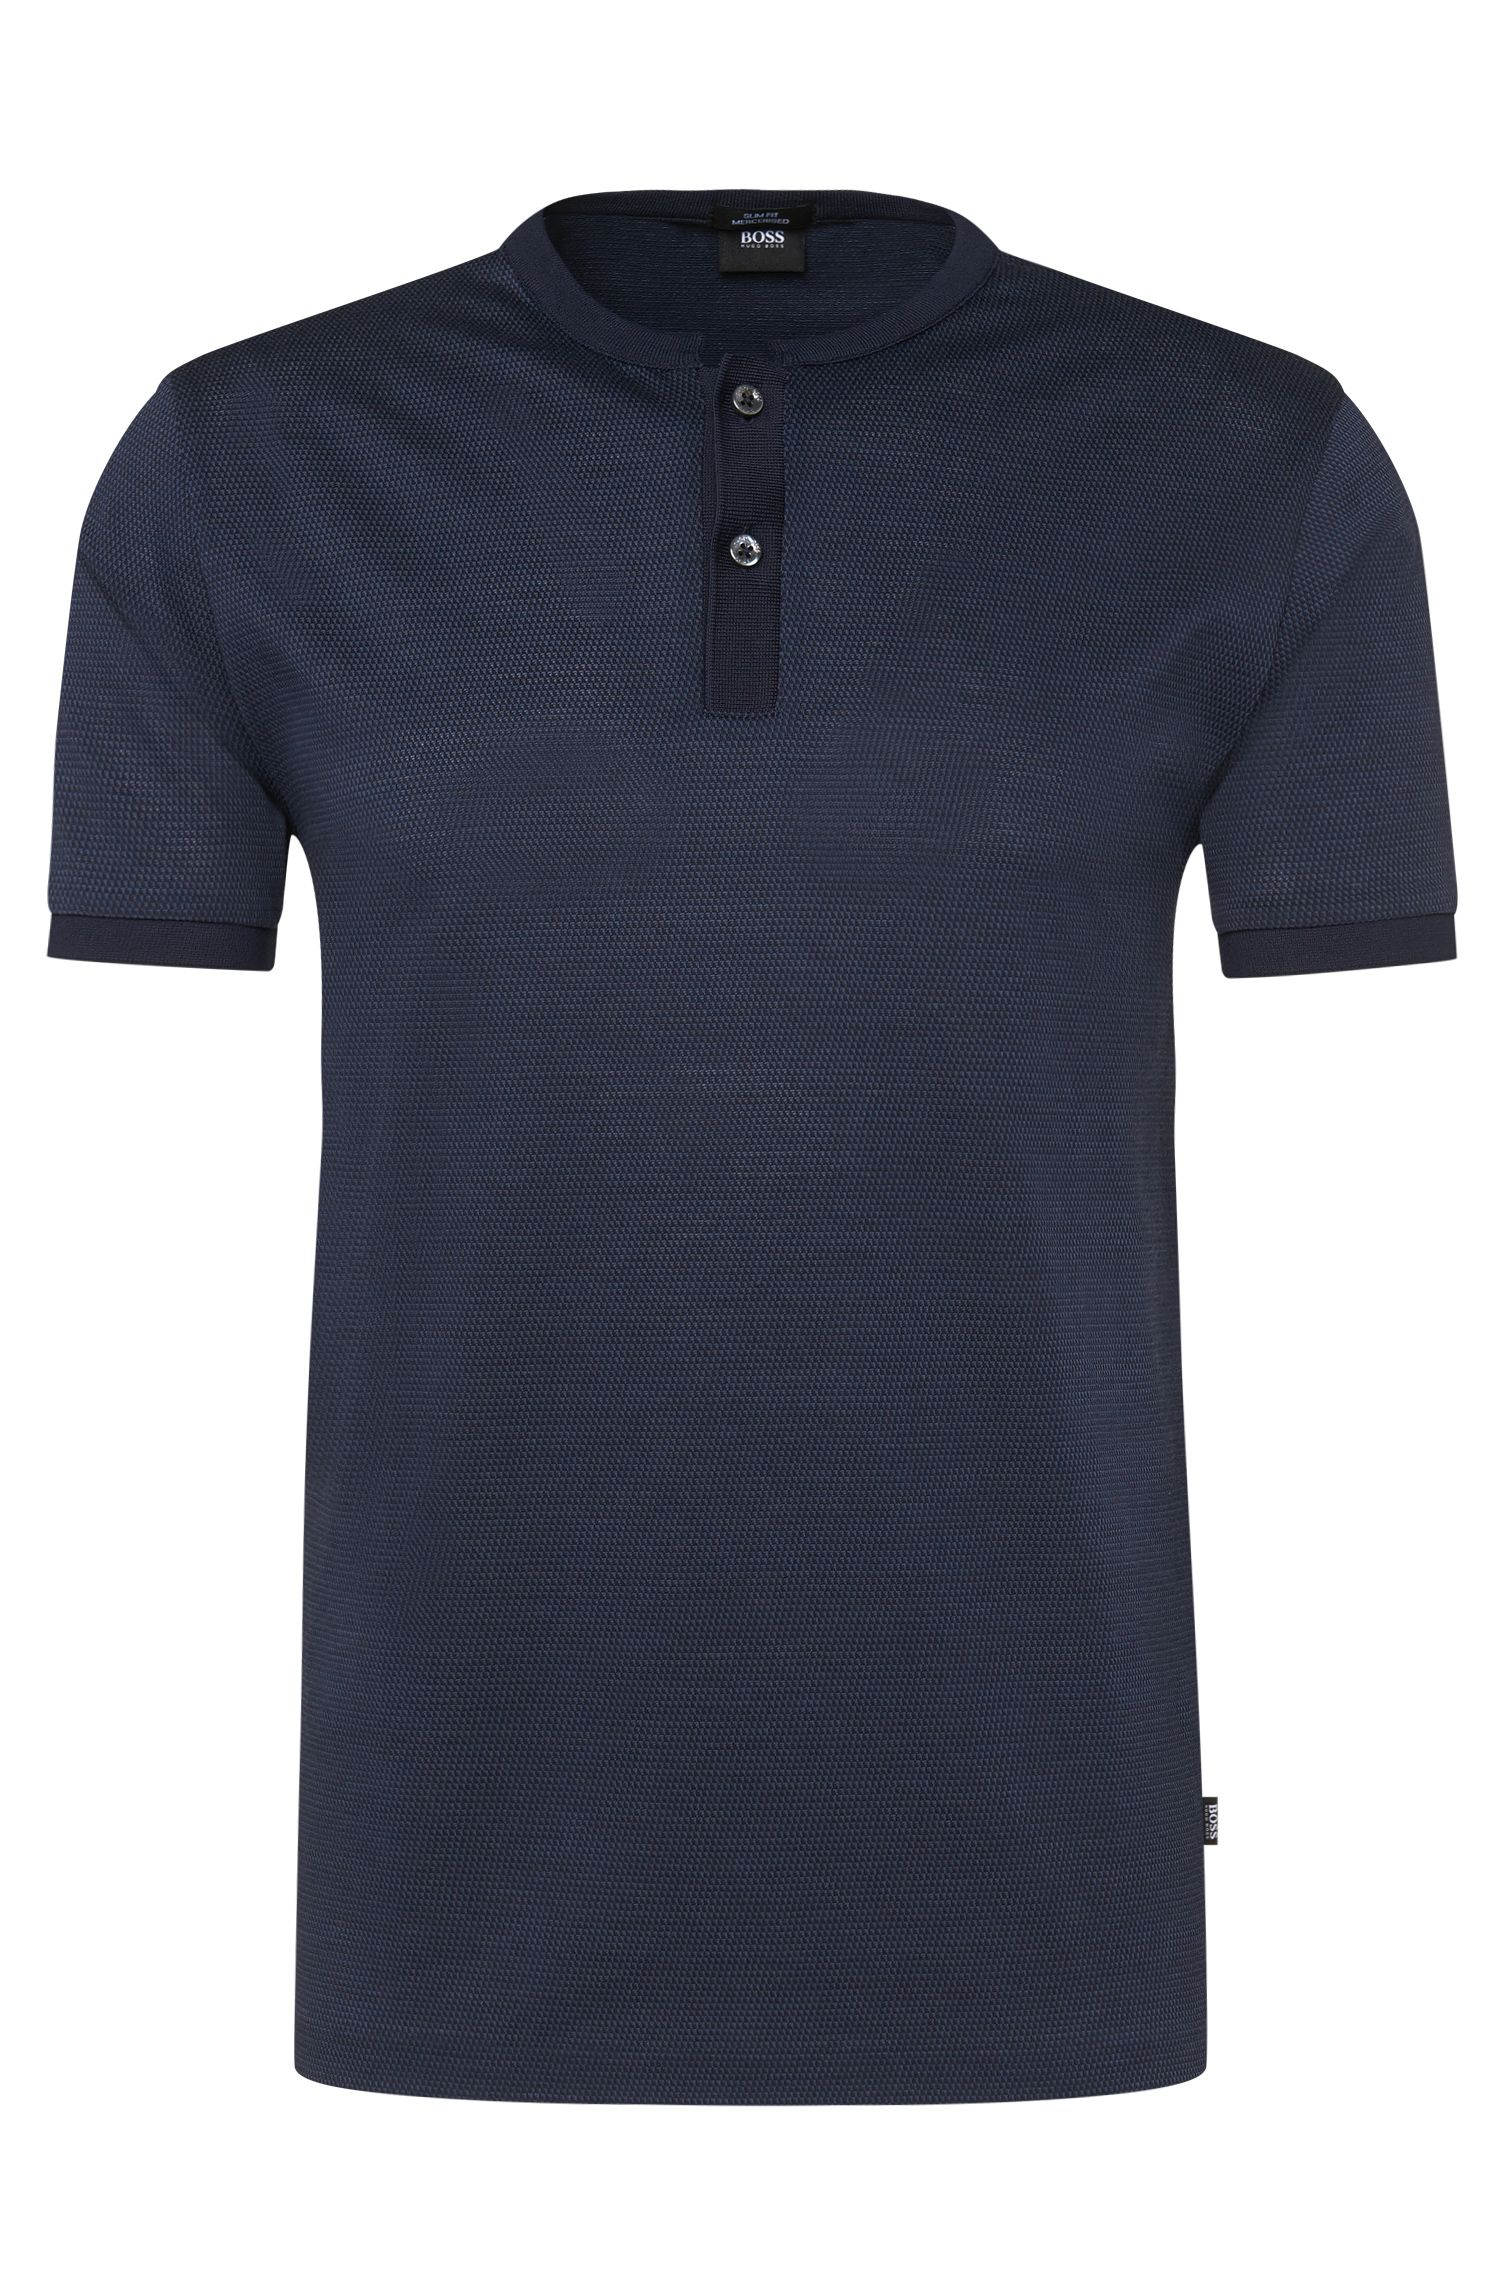 T-shirt Slim Fit en coton: «Tiller02»